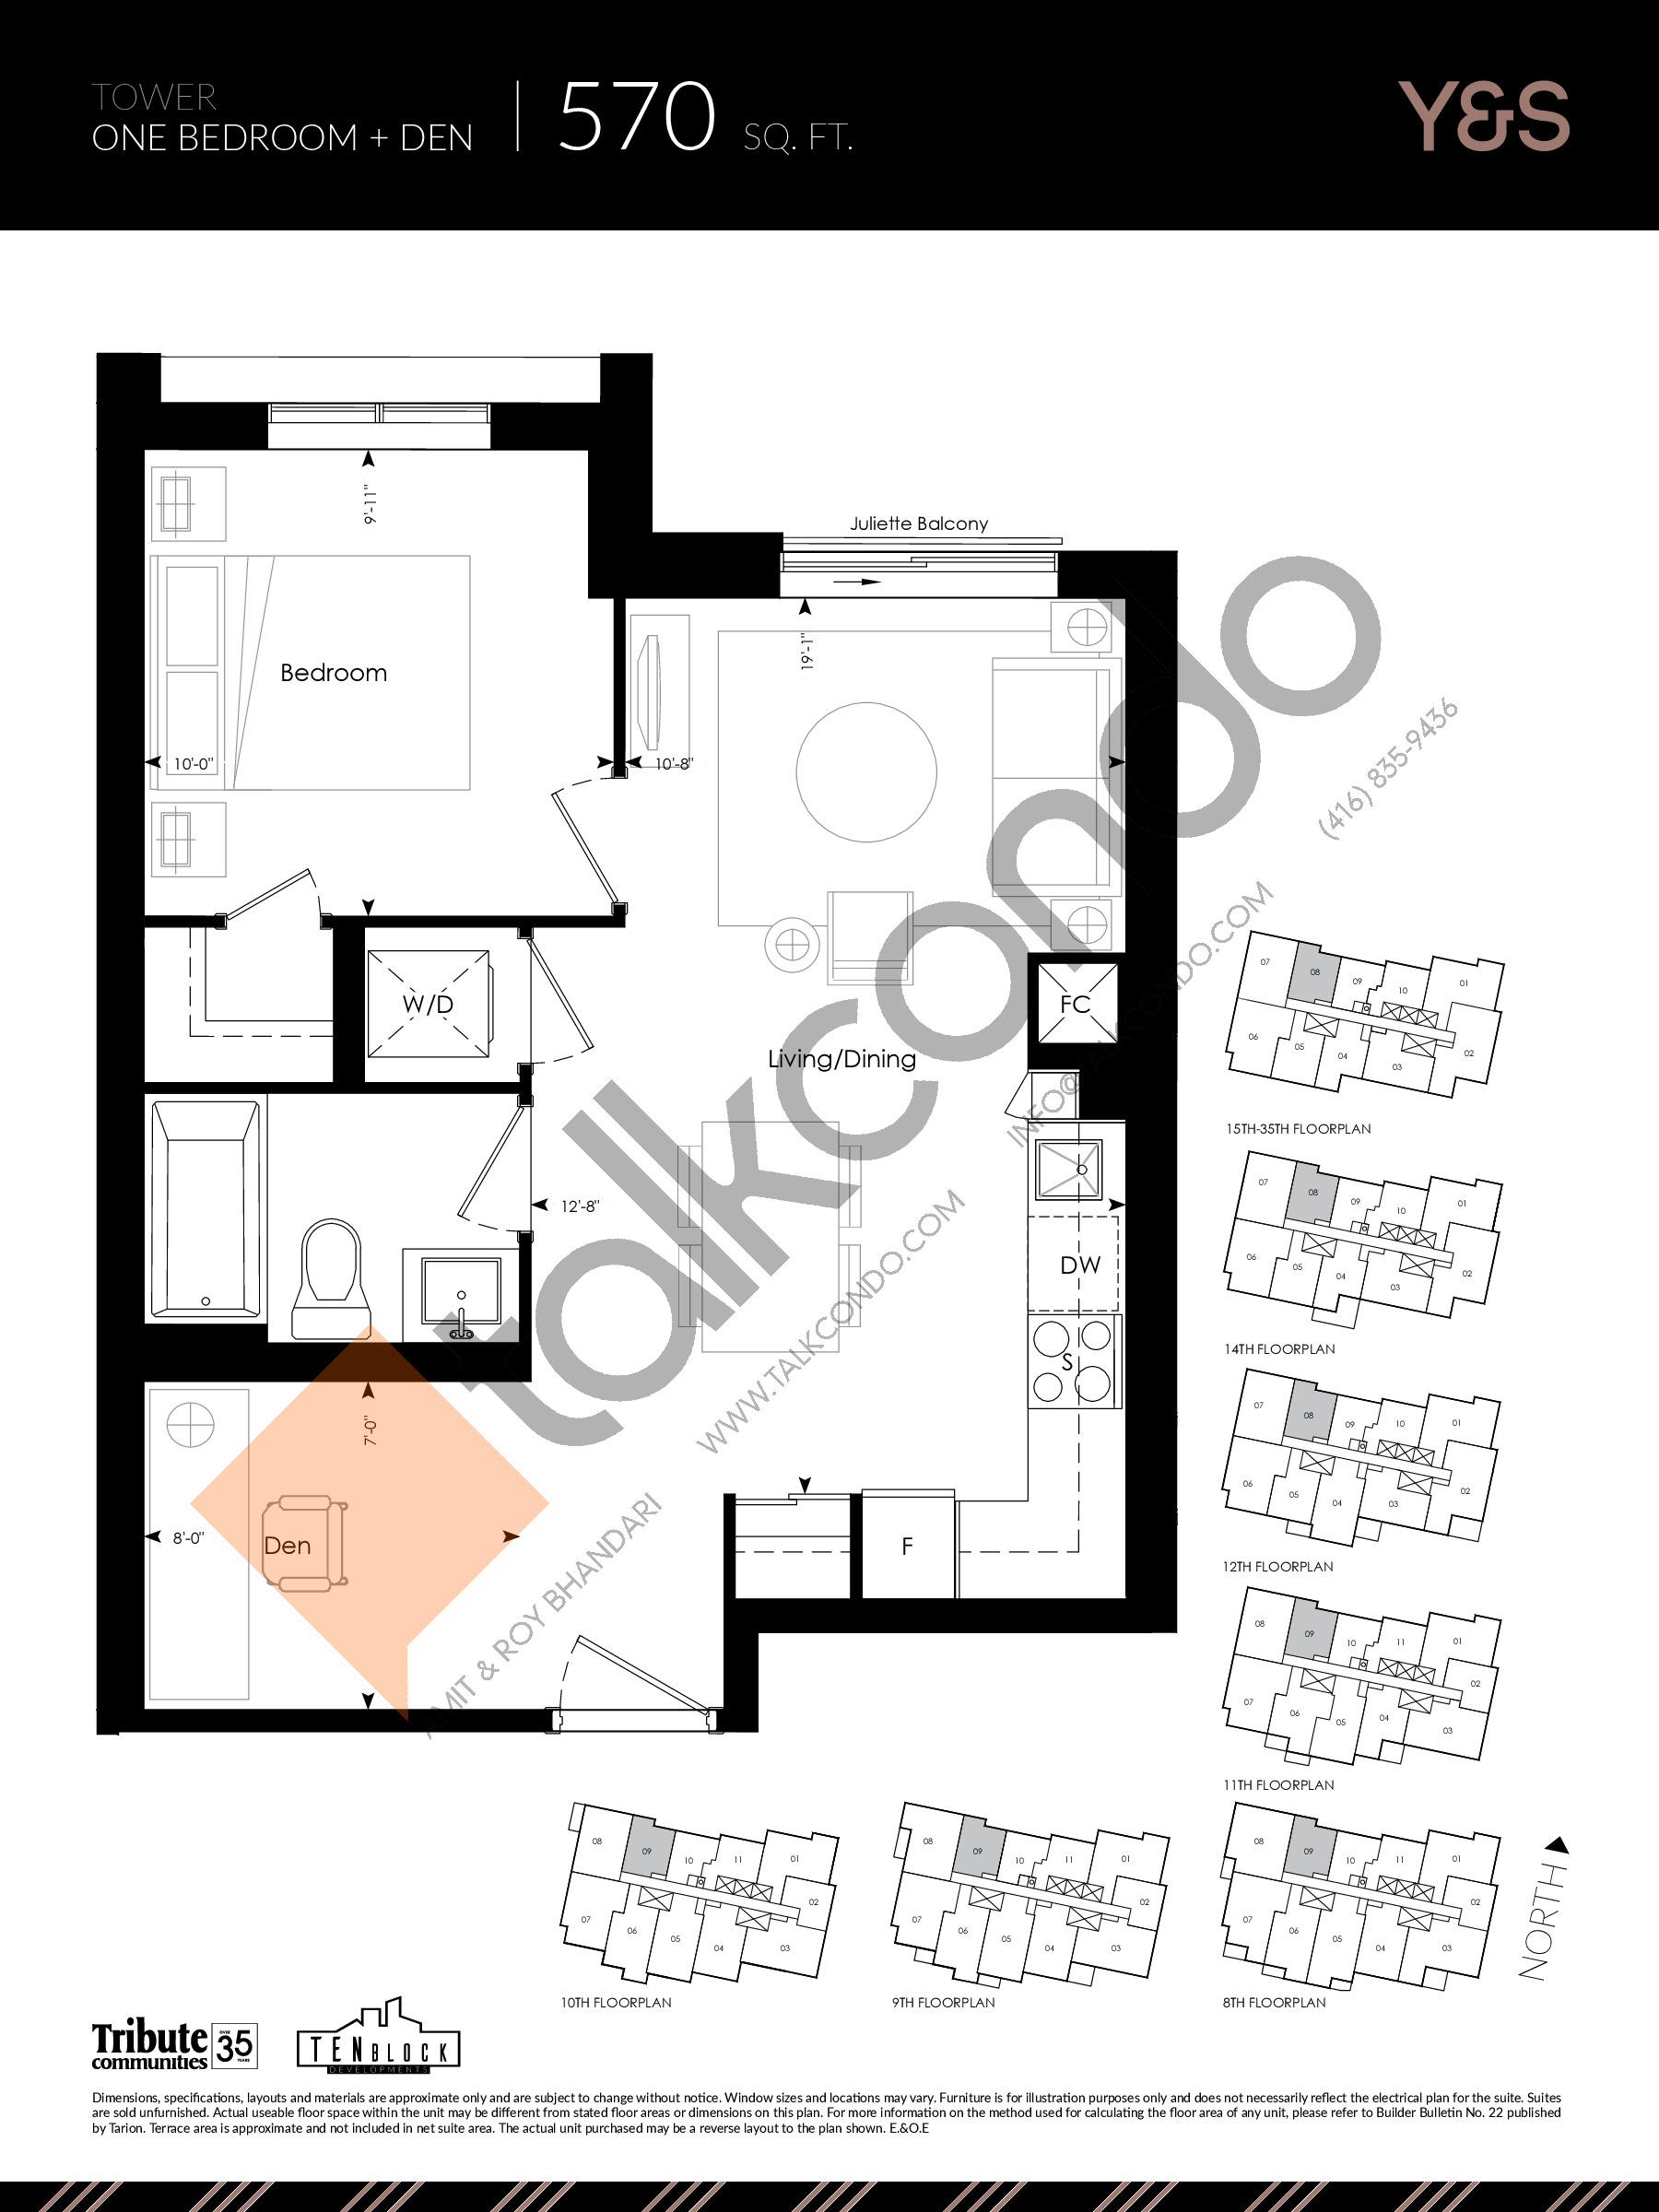 570 sq. ft. Floor Plan at Y&S Condos - 570 sq.ft